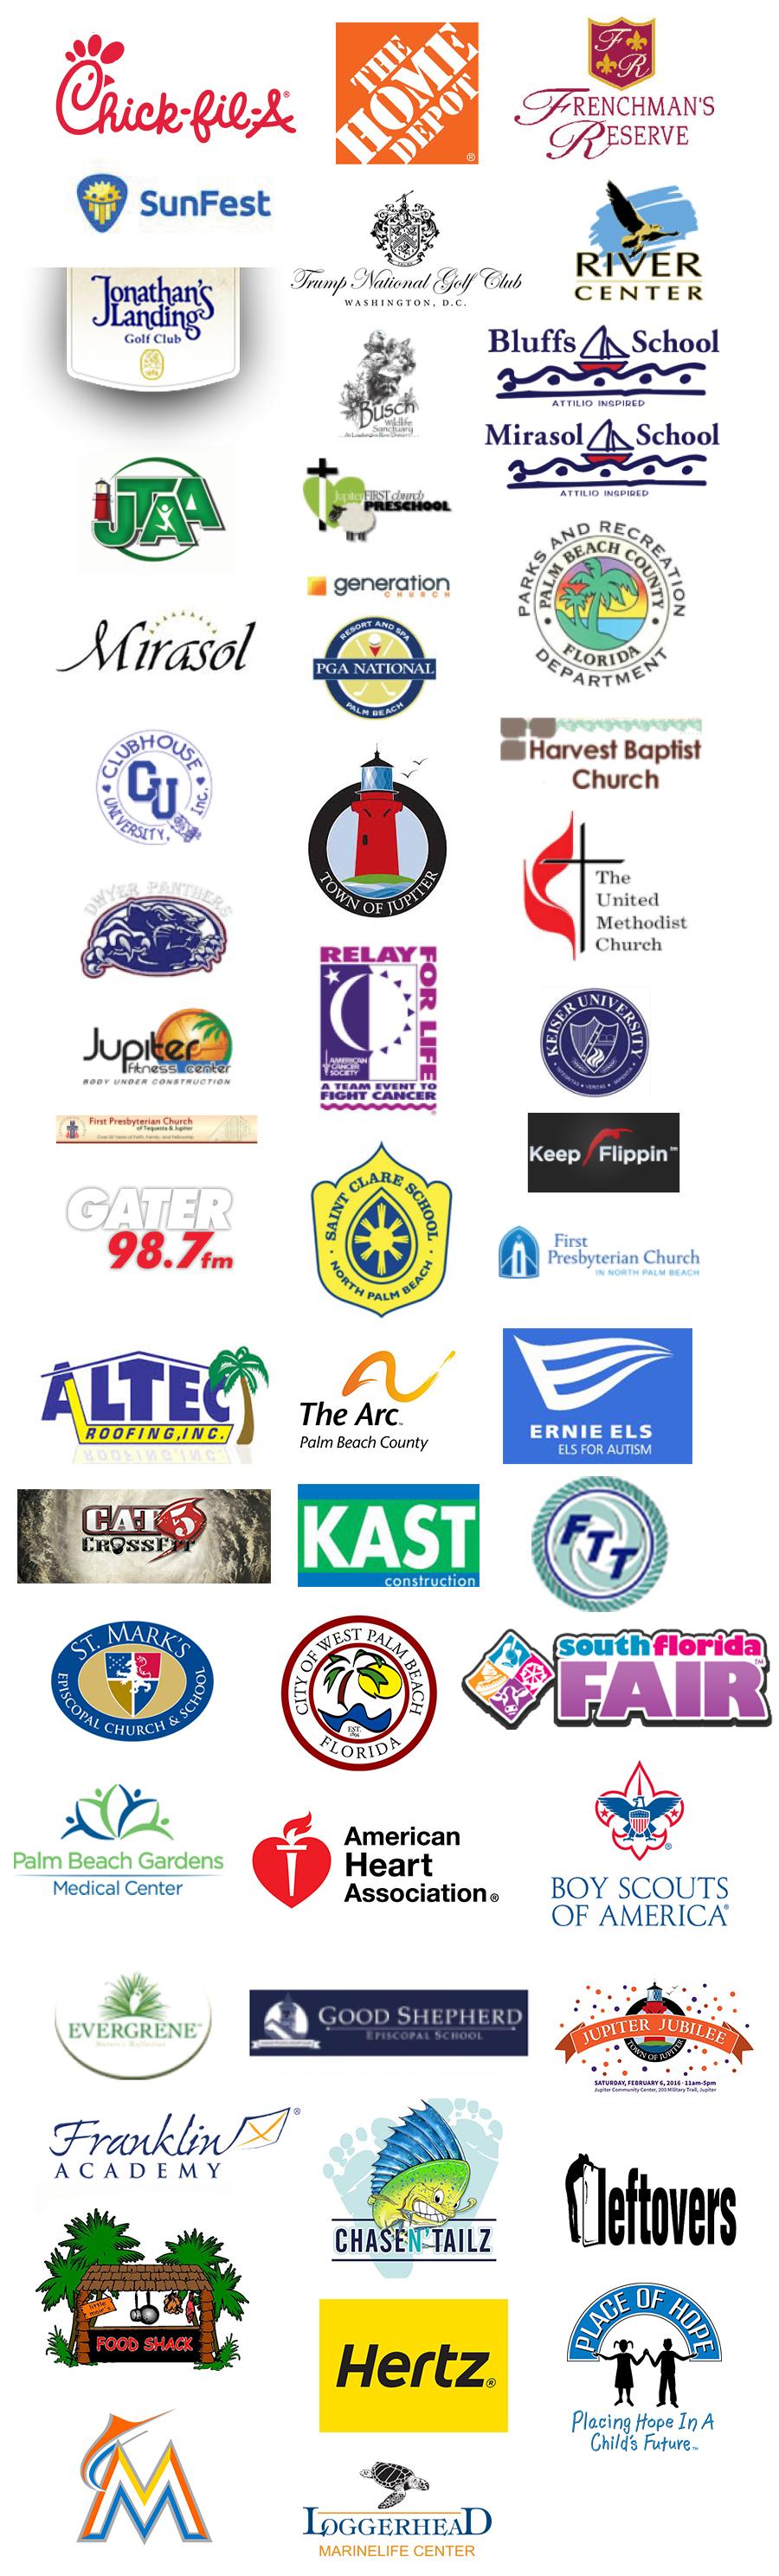 Company logos for website 5.22.18.jpg